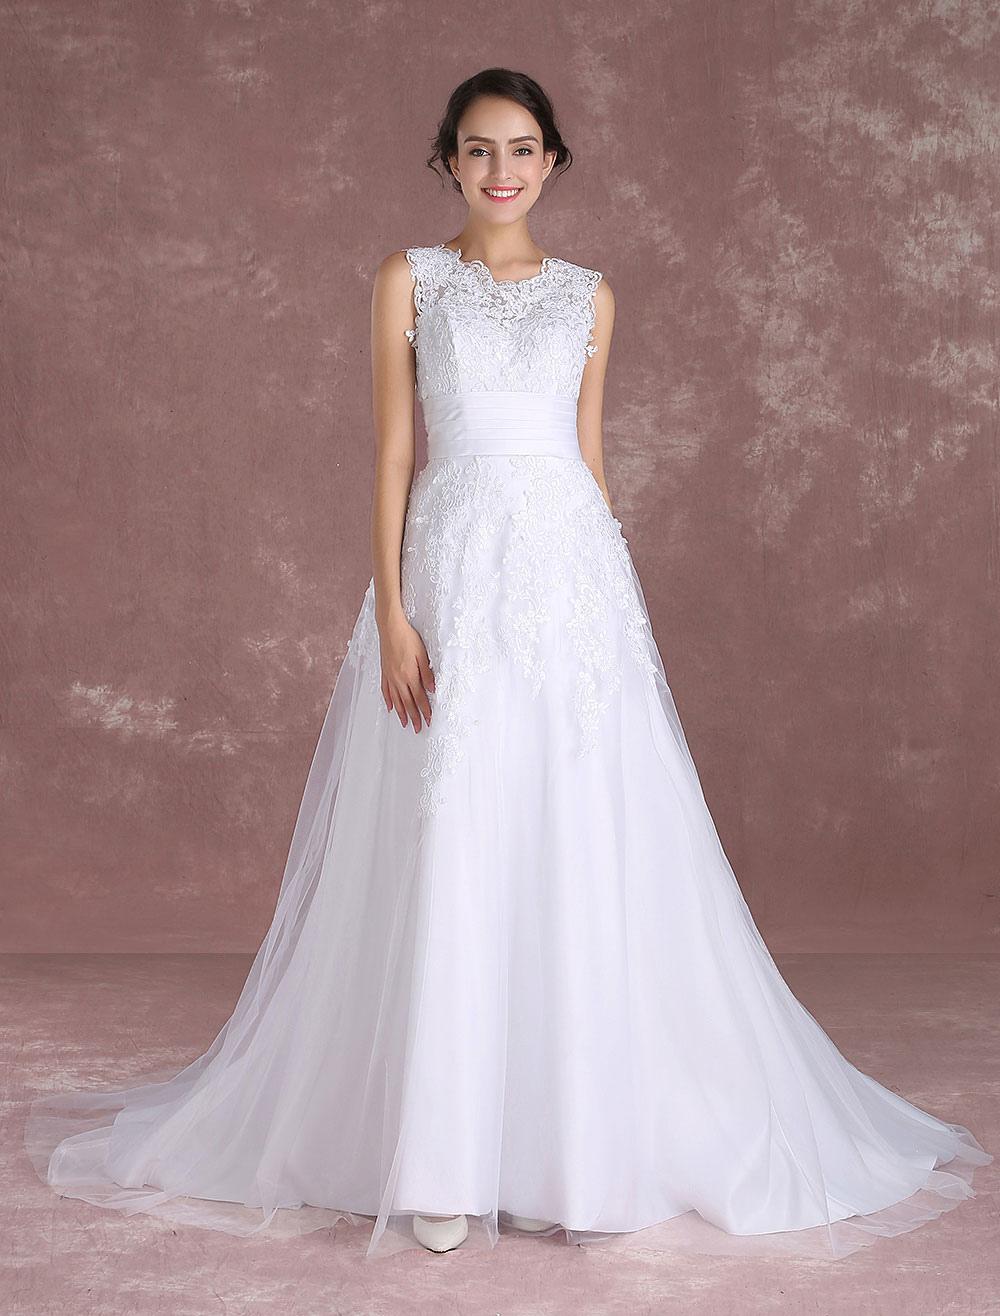 White Wedding Dresses Lace Applique Sleeveless Bridal Gown Detachable Train Satin Sash Dressno: White Wedding Dresses No At Websimilar.org